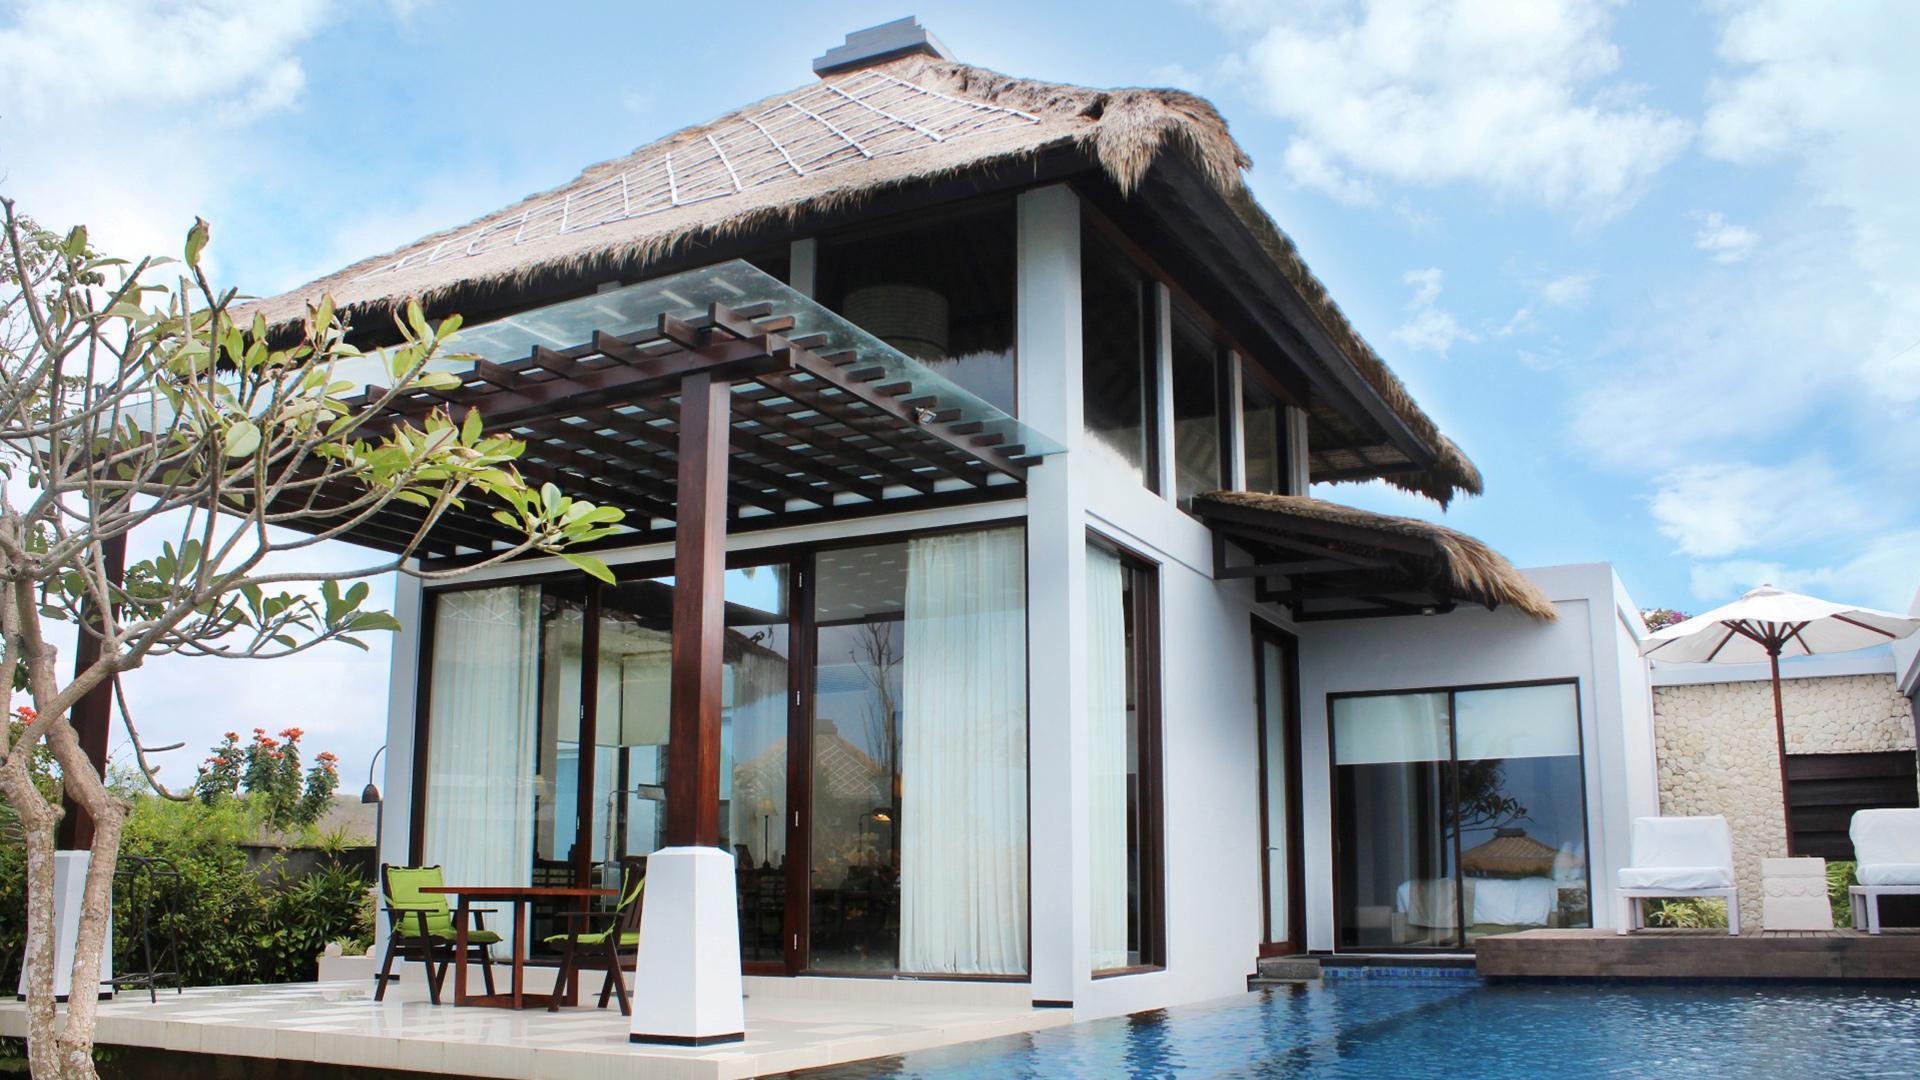 One Bedroom Ocean Pool Villa image 1 at Samabe Bali Suites & Villas by Kabupatén Badung, Bali, Indonesia